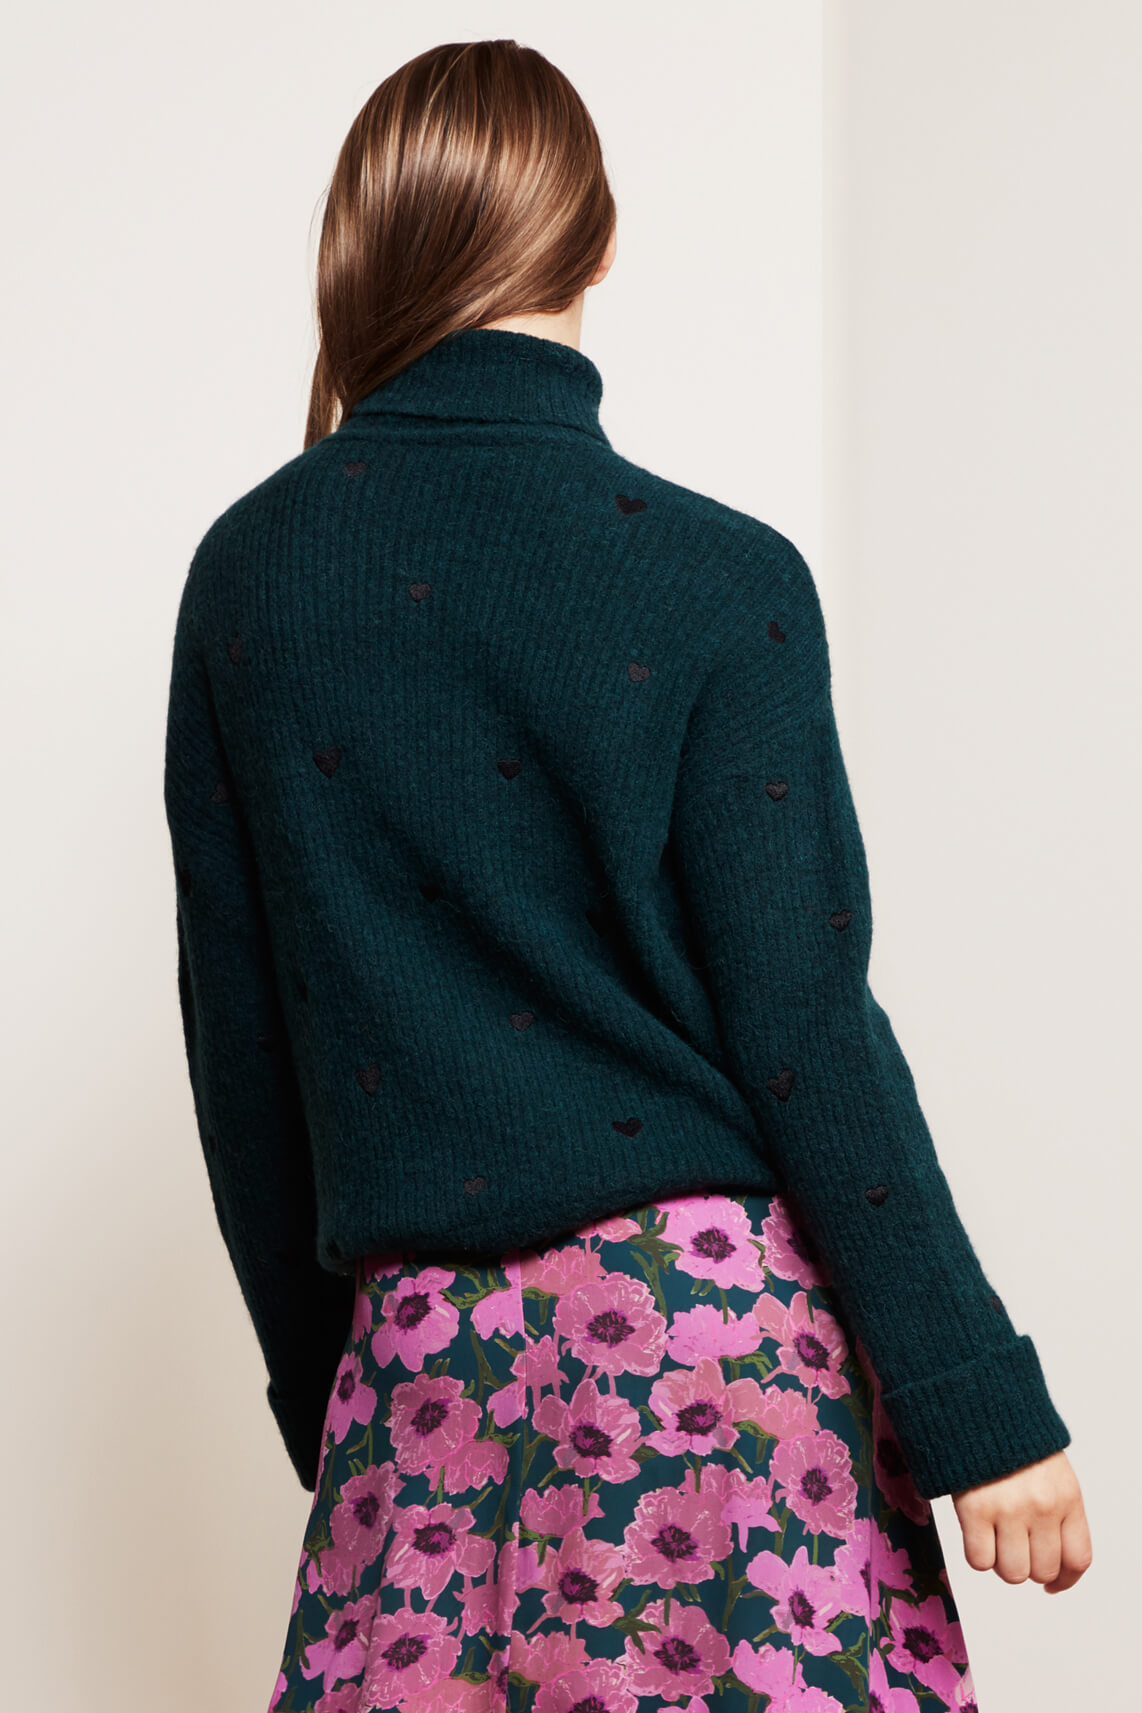 Fabienne Chapot Dames Olivia pullover groen